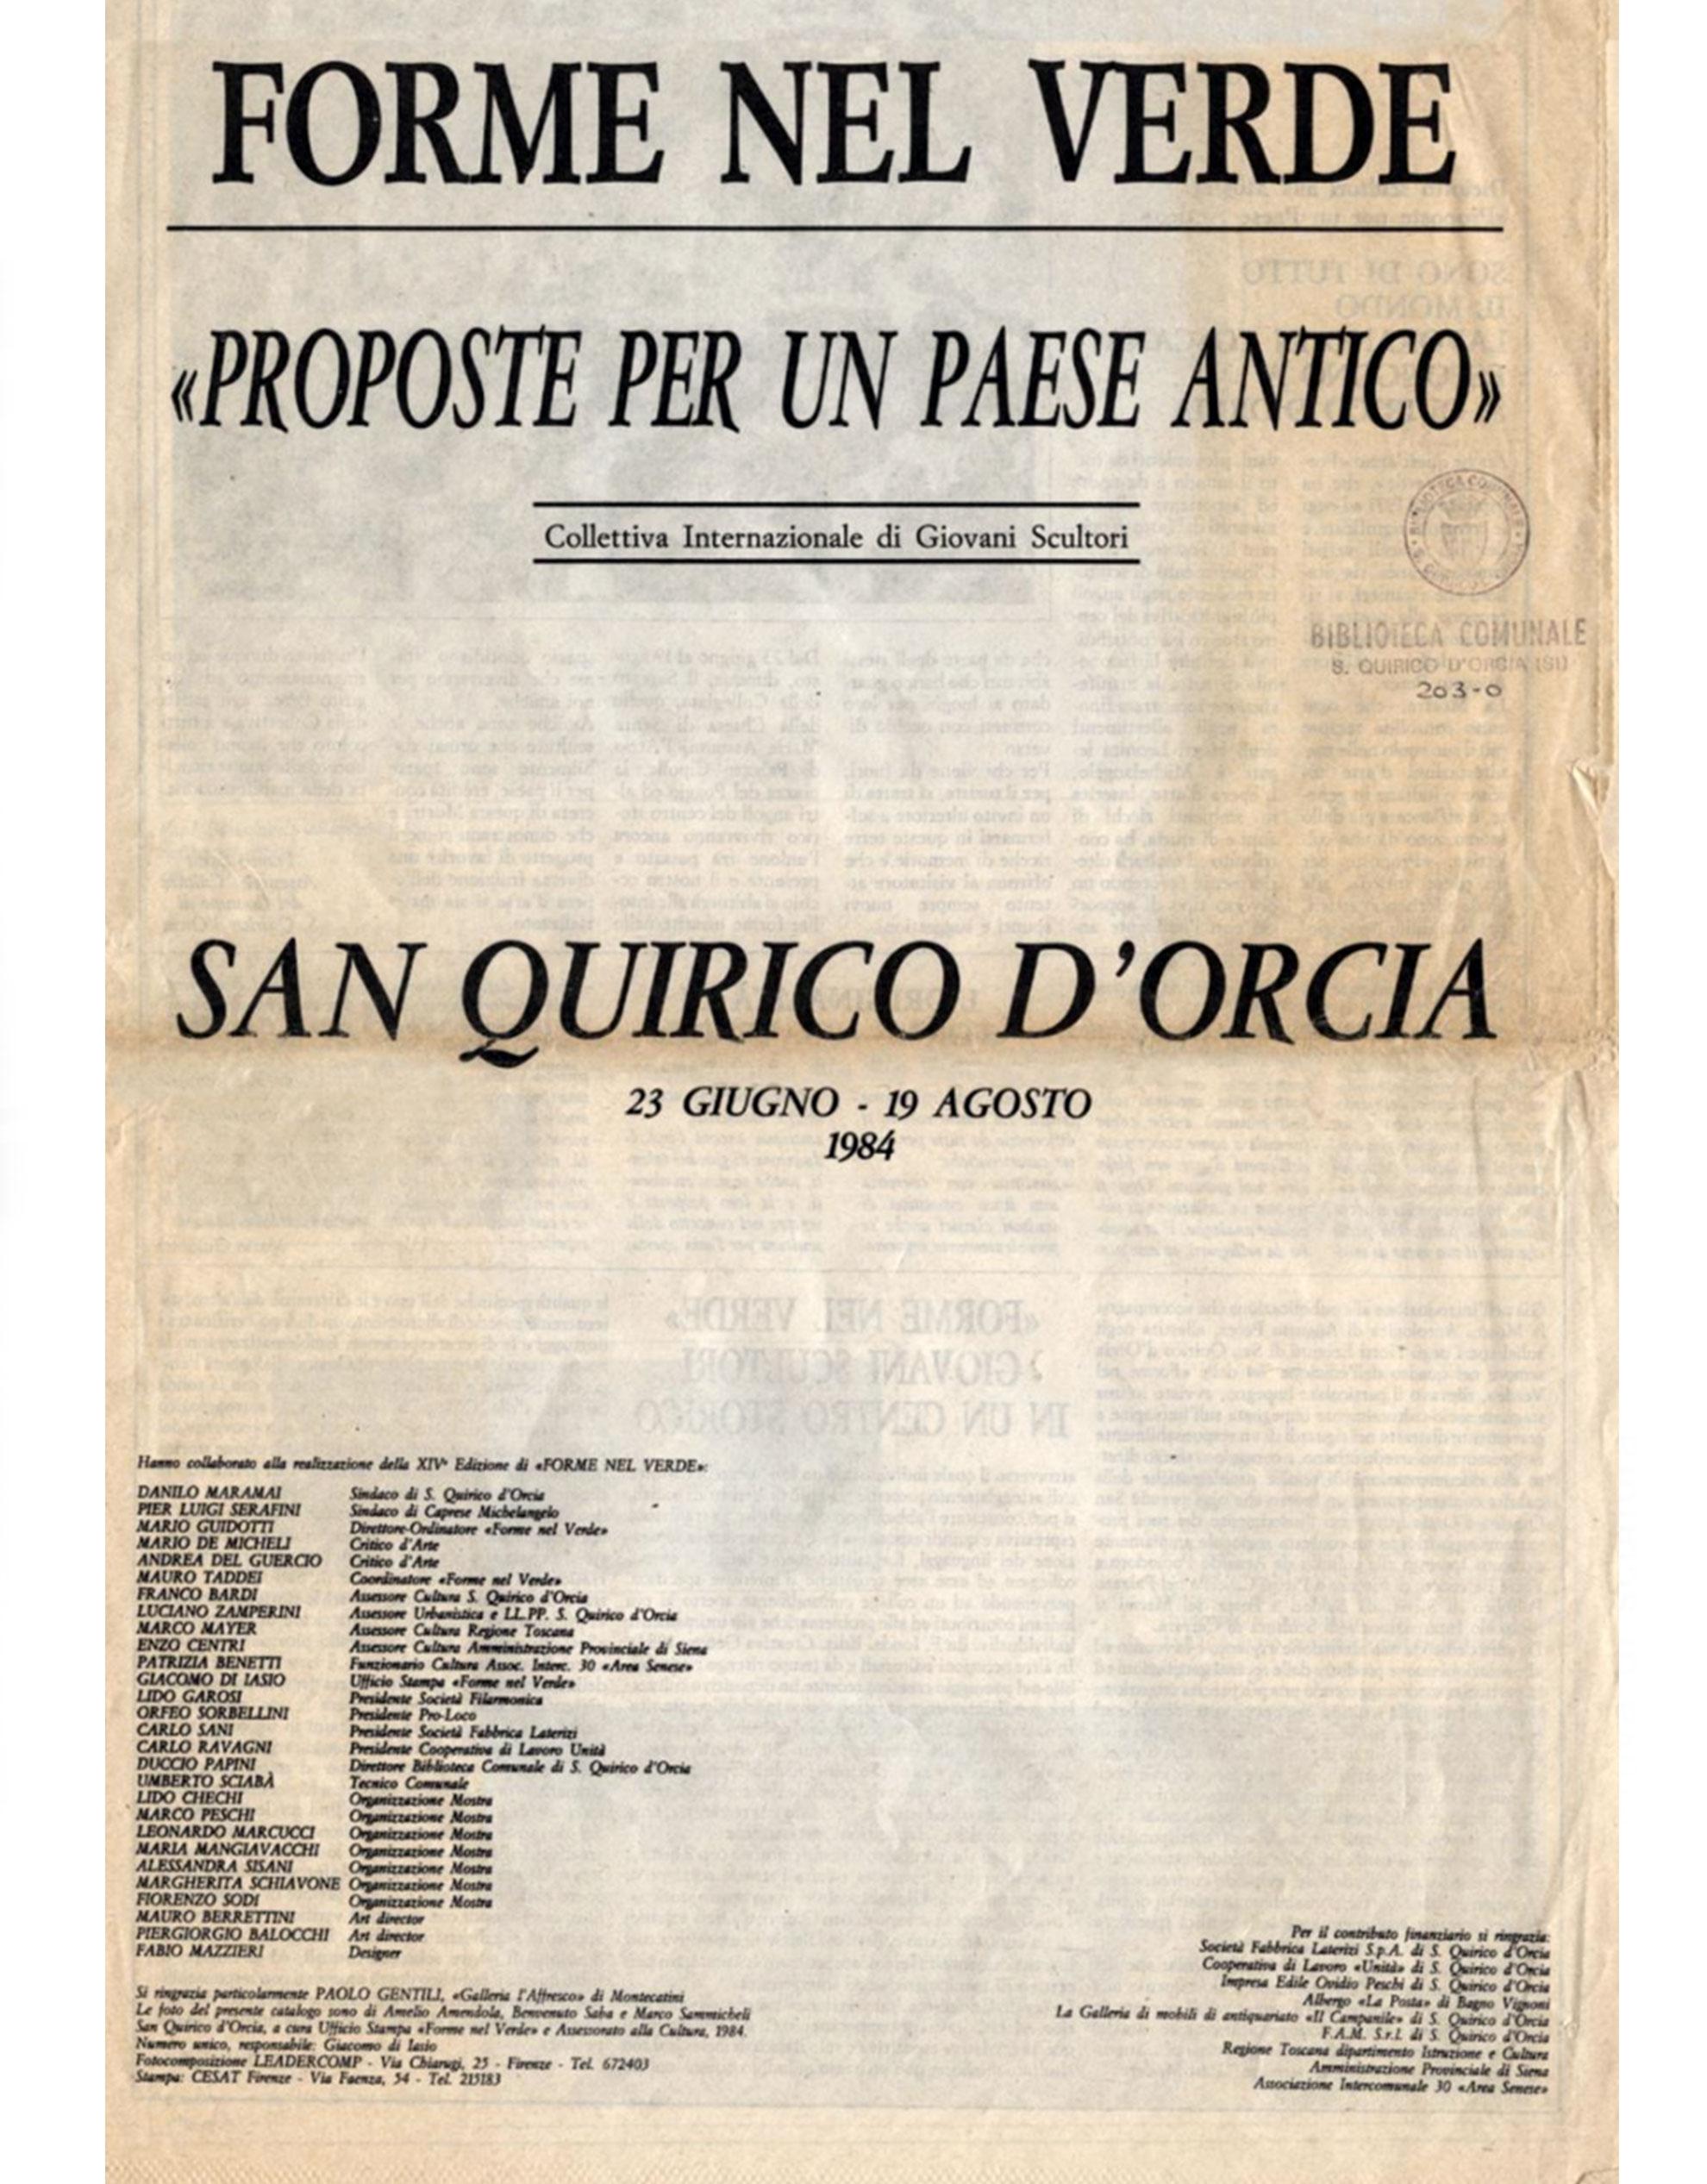 Catalogo Forme nel Verde 1984